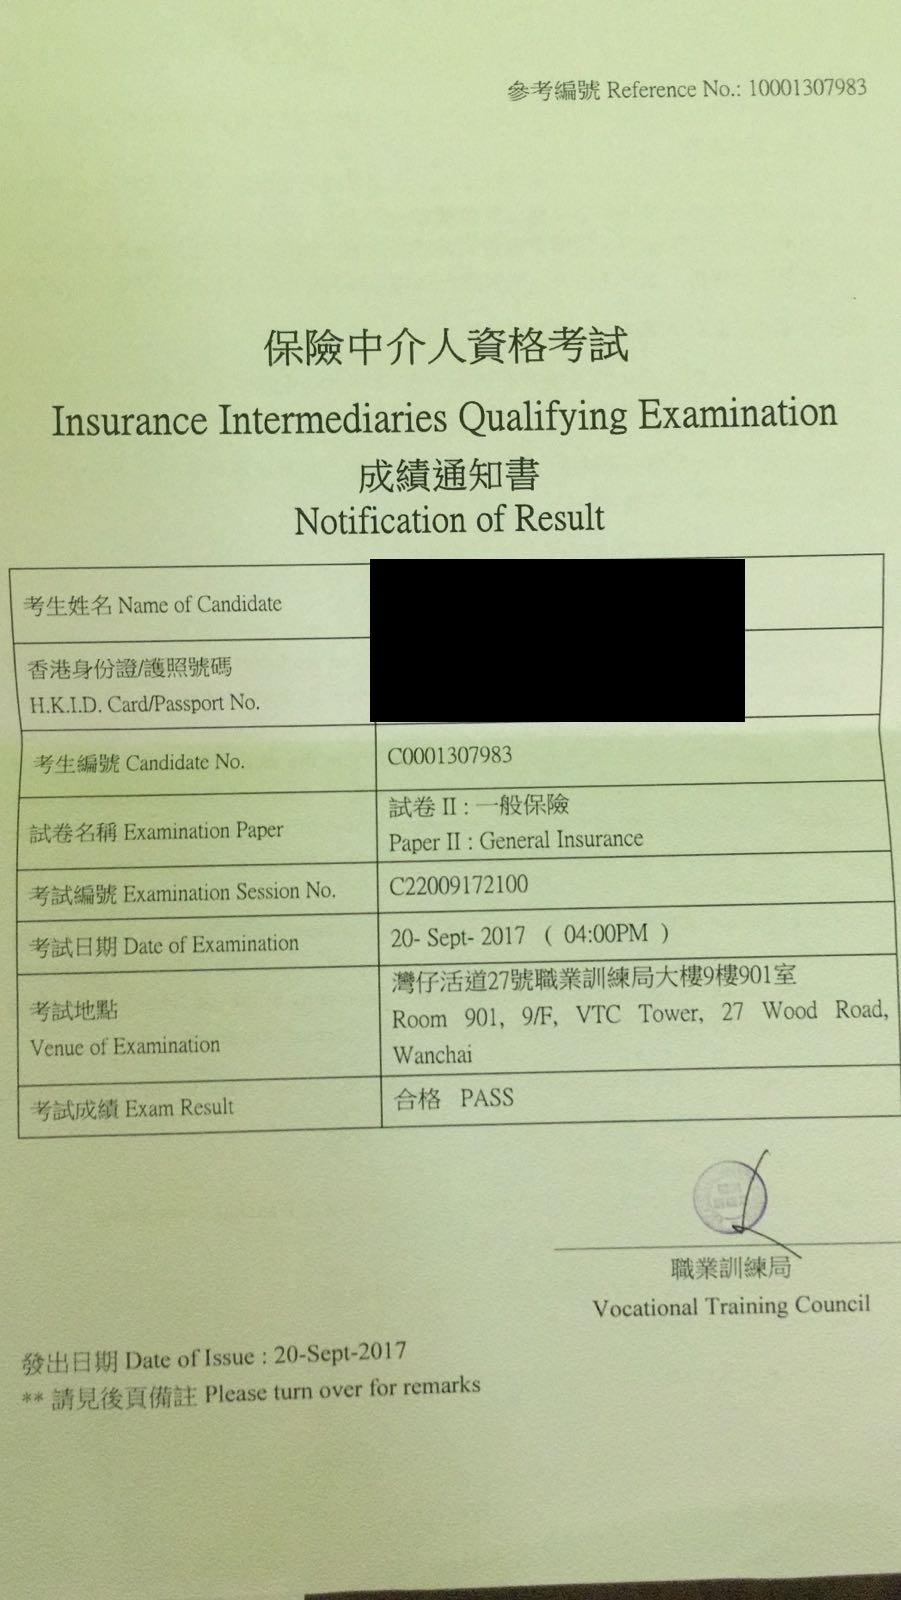 TBWT 20/9/2017 IIQE Paper 2 保險中介人資格考試卷二